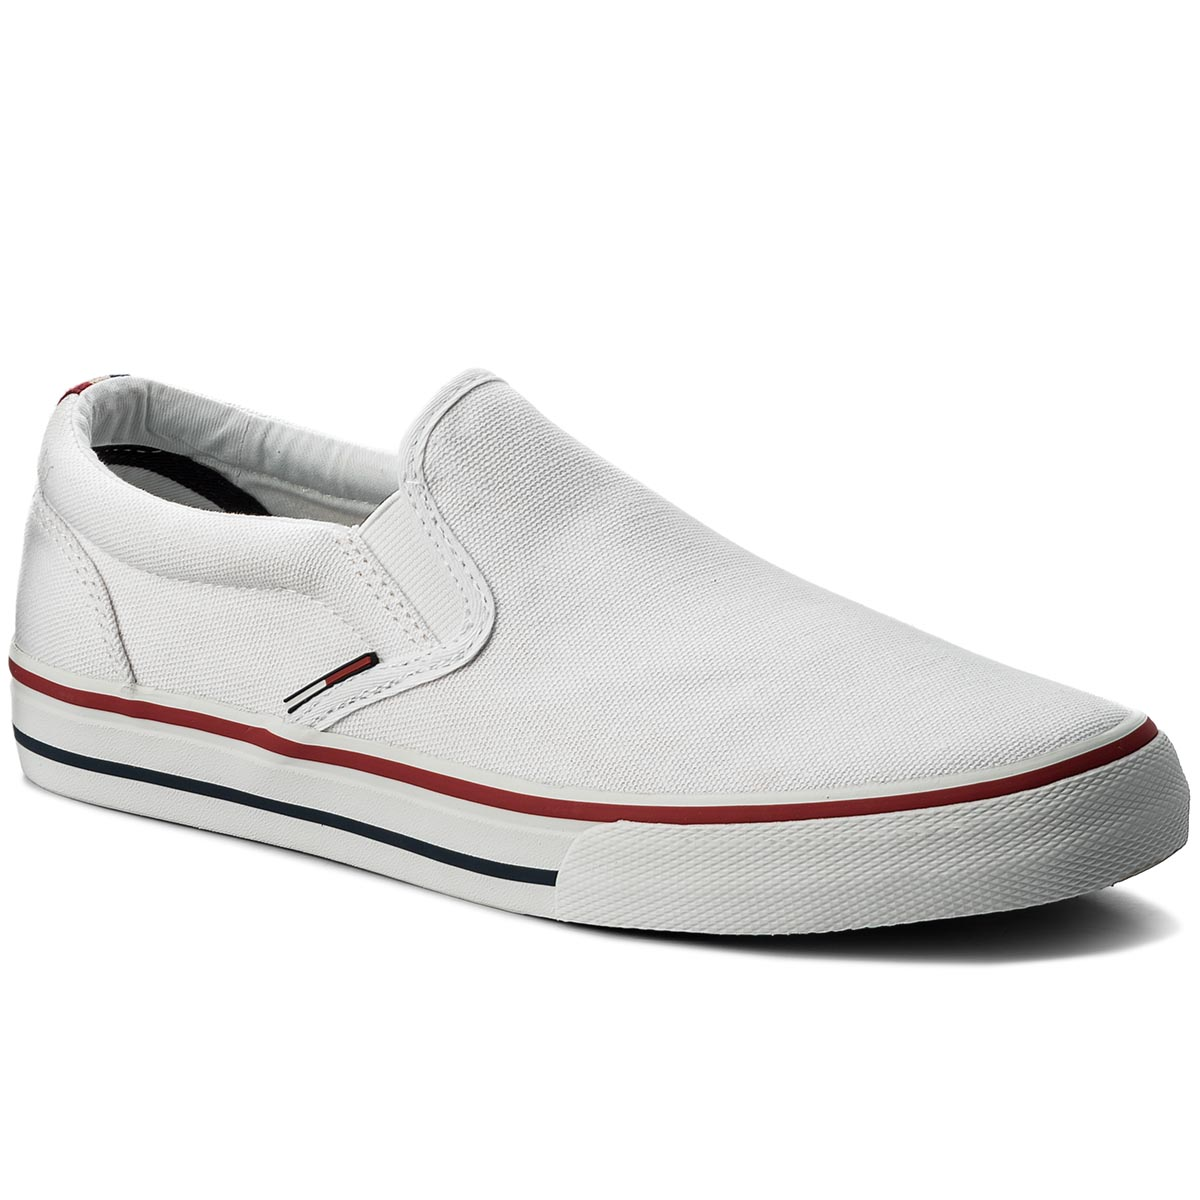 Teniszcipő TOMMY JEANS - Textile Slip On EM0EM00002 White 100 - Glami.hu aea953a035